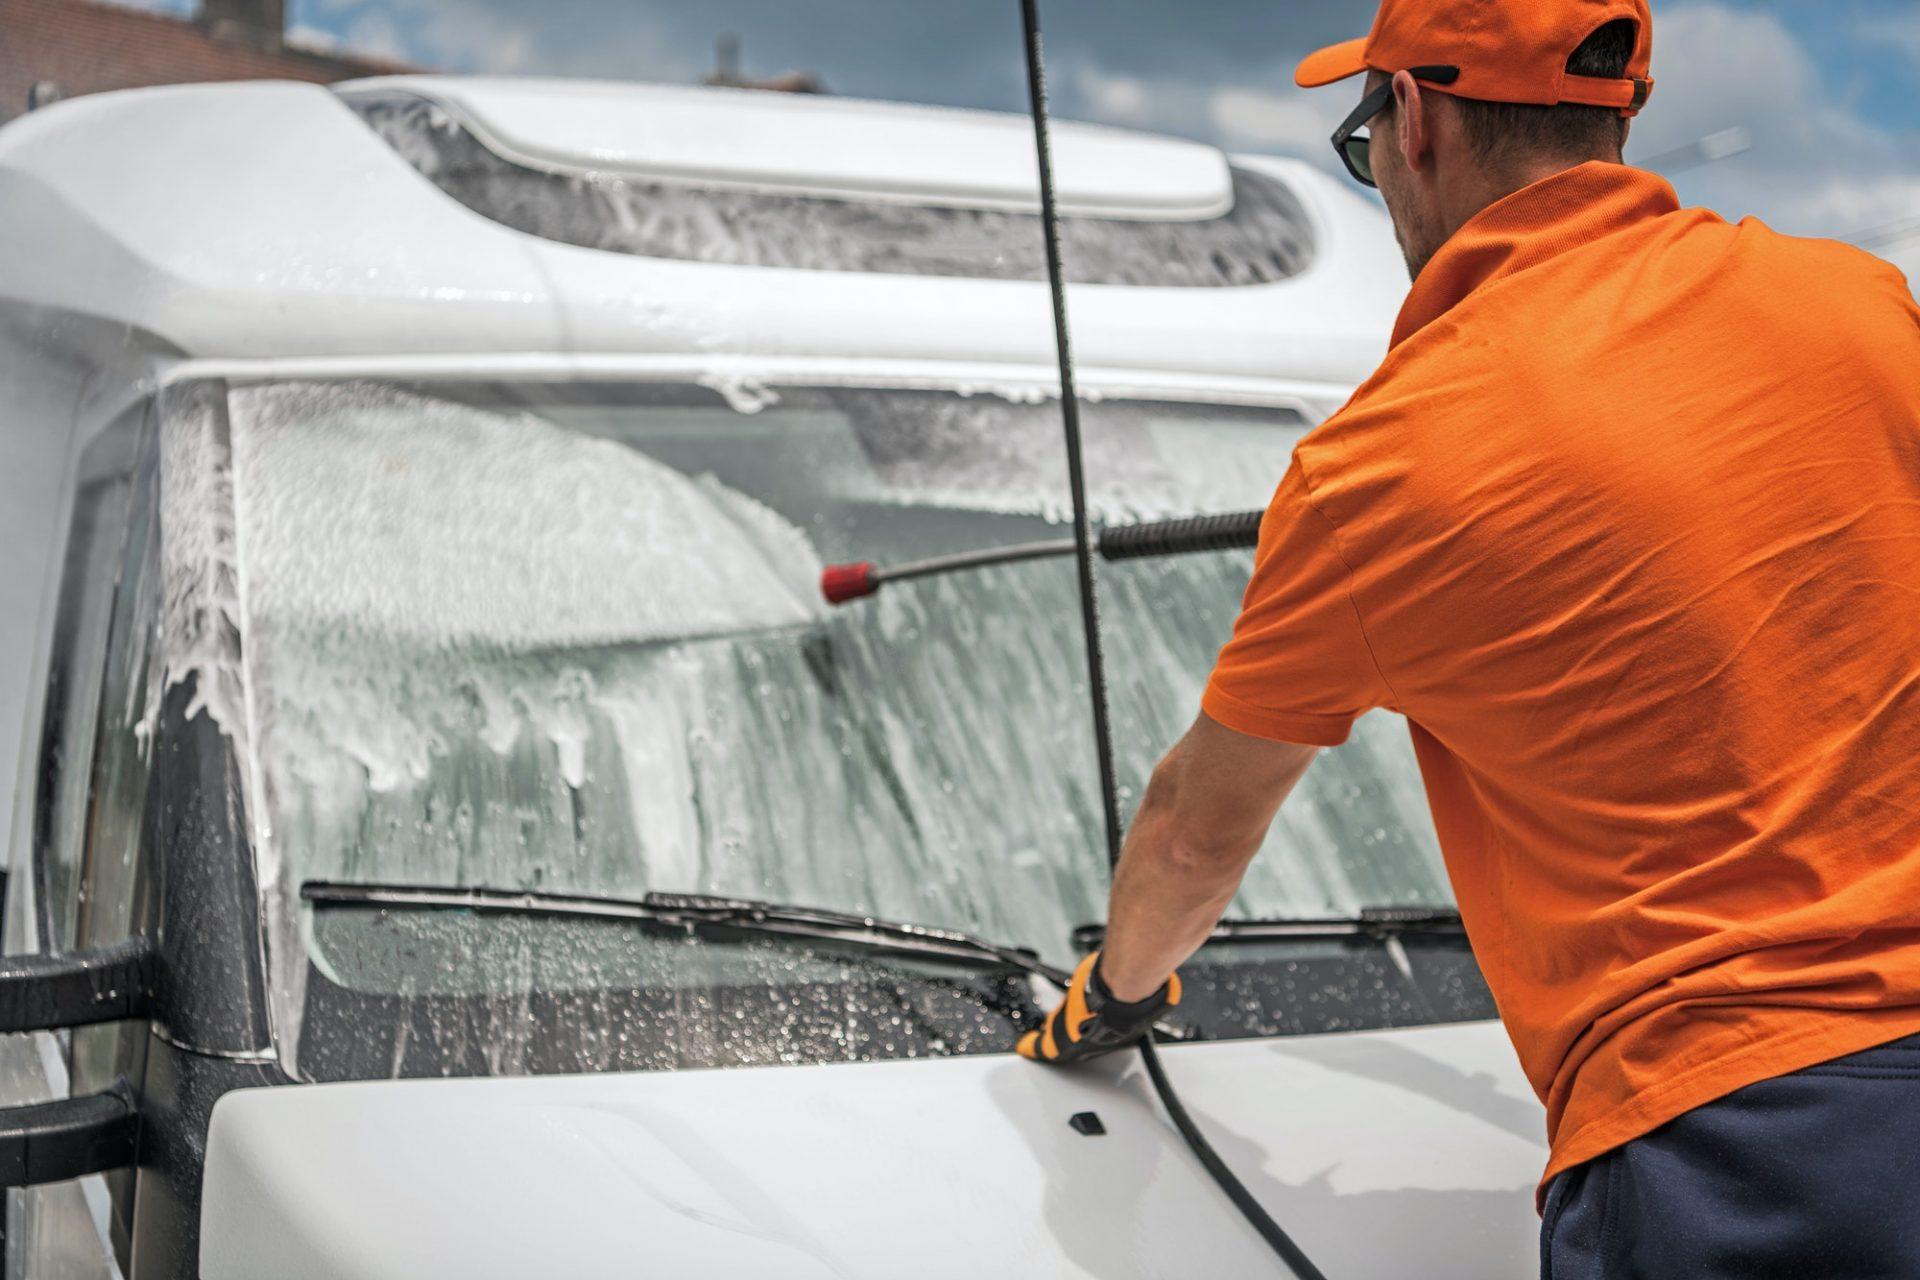 Men Pressure Washing His Truck Windshield